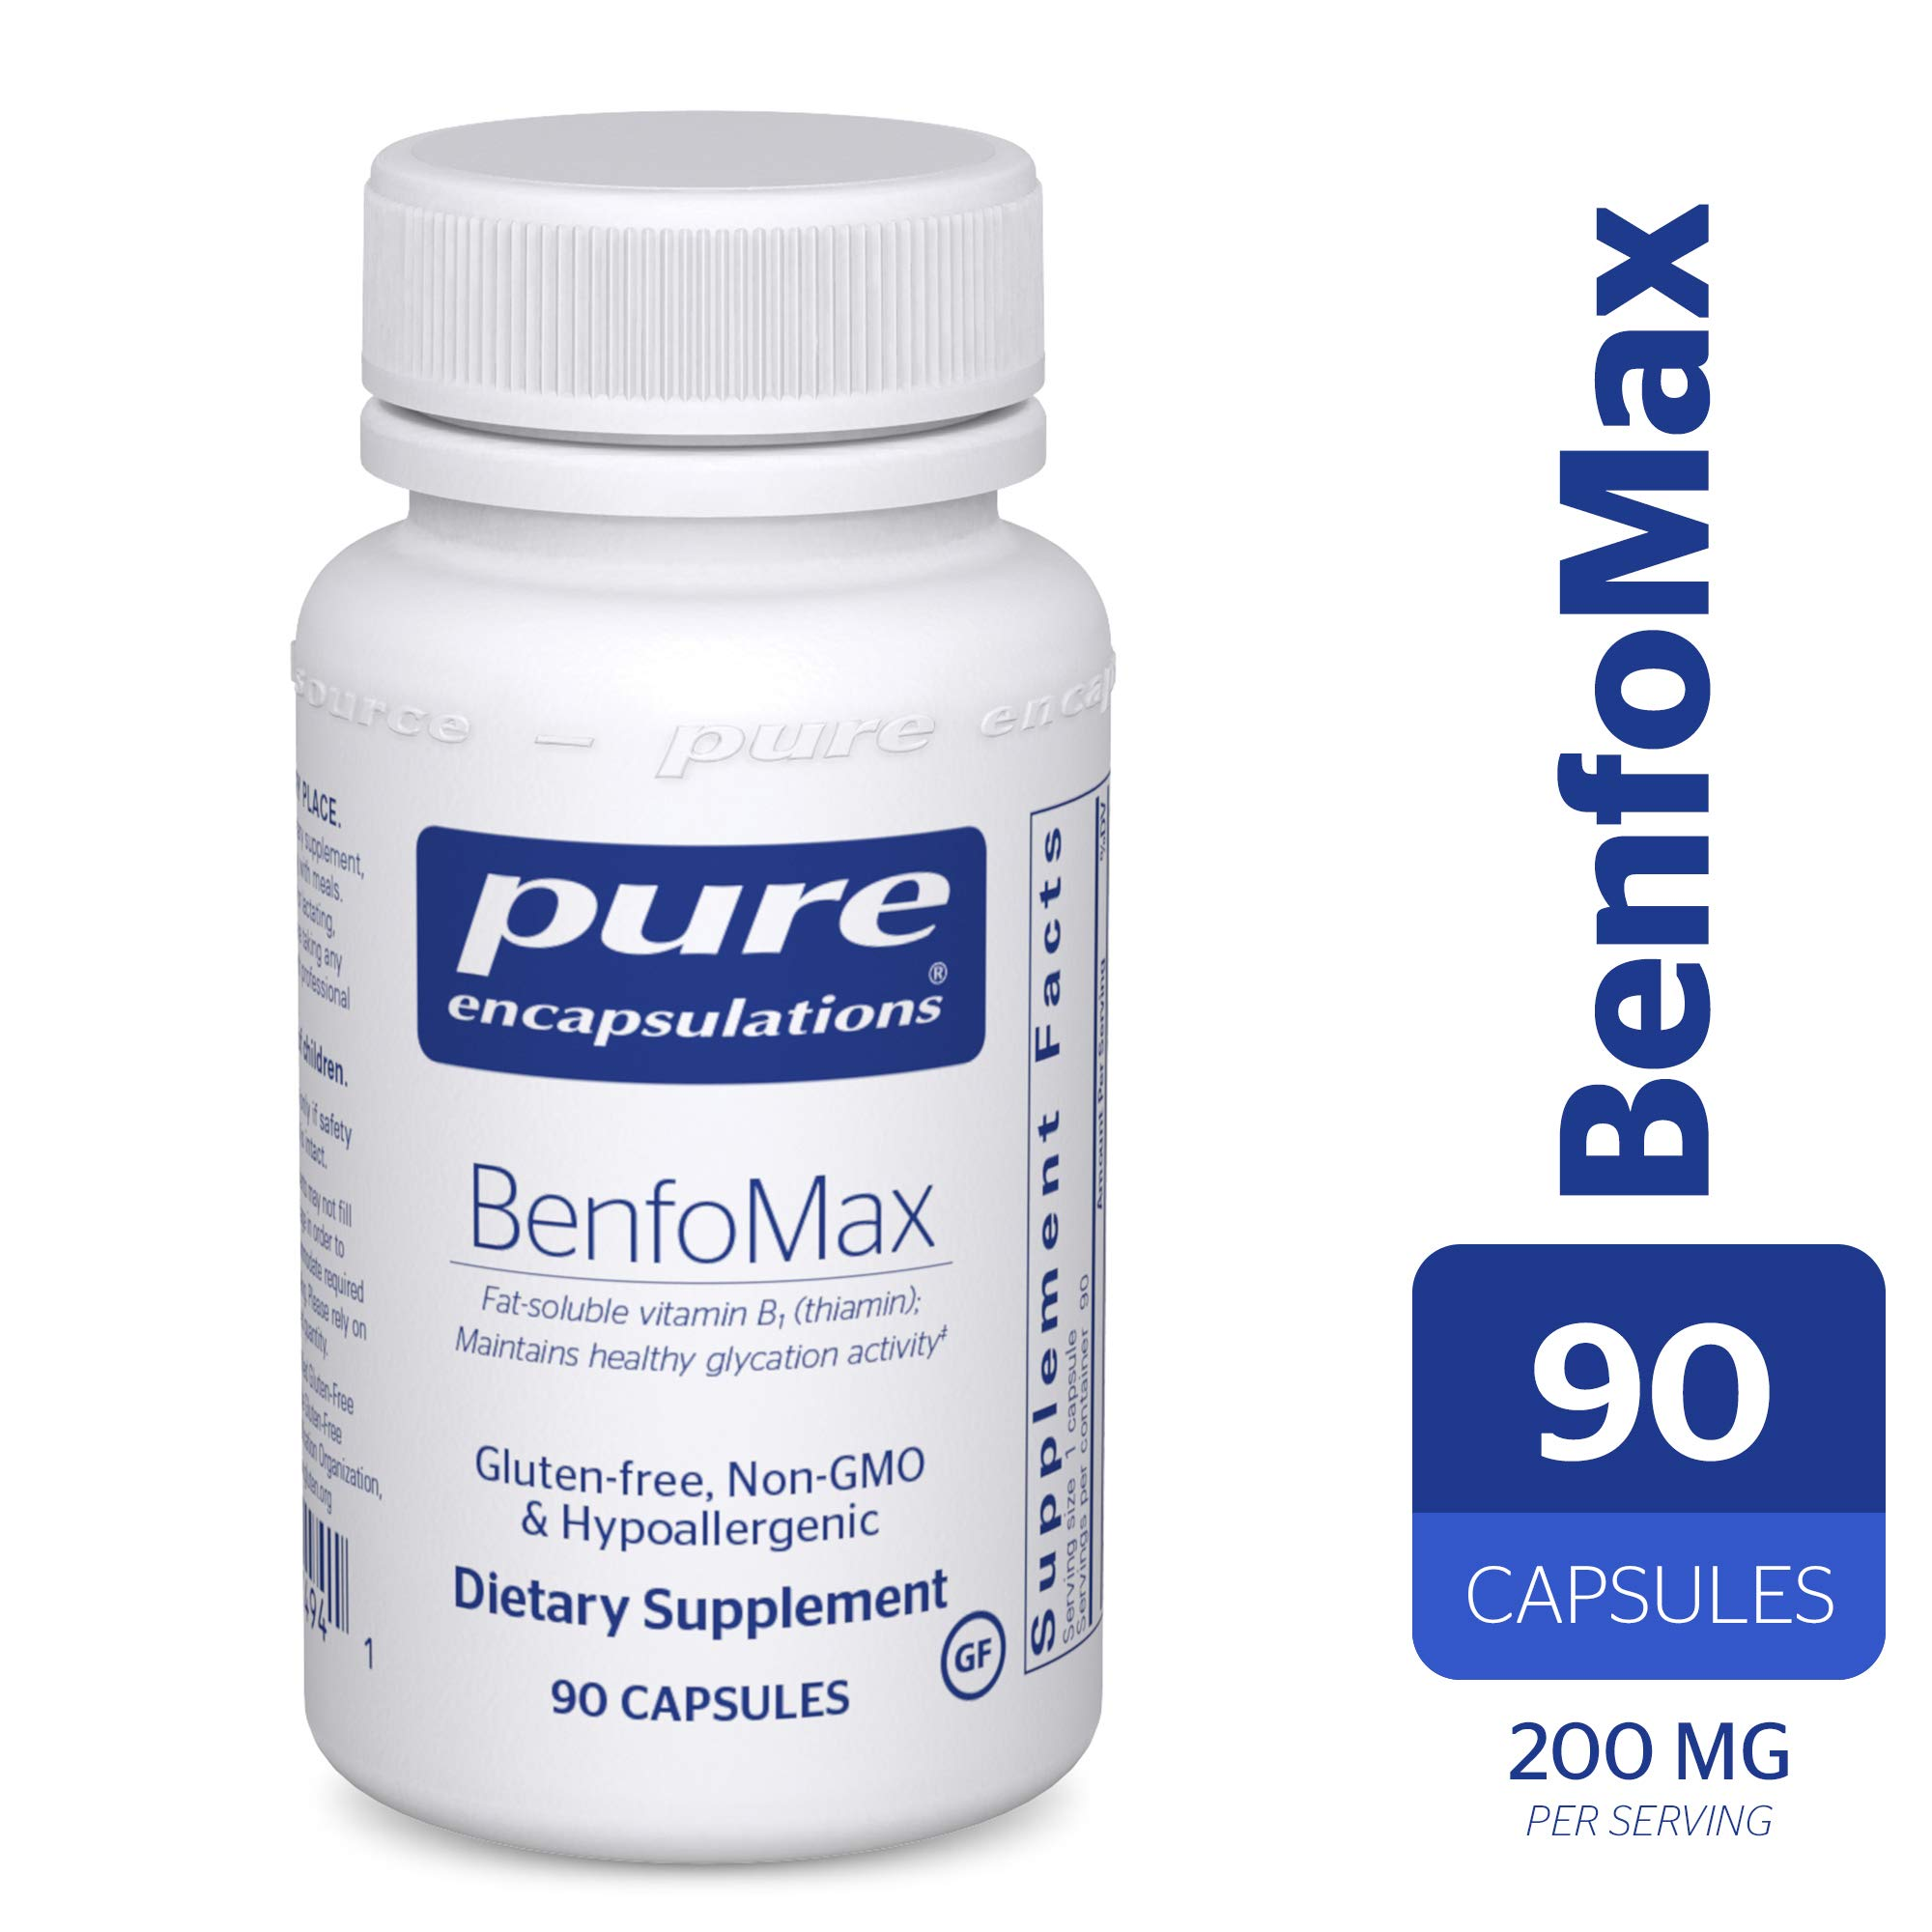 Pure Encapsulations - BenfoMax - Hypoallergenic, Fat-Soluble Vitamin B1 (Thiamine) Supplement - 90 Capsules